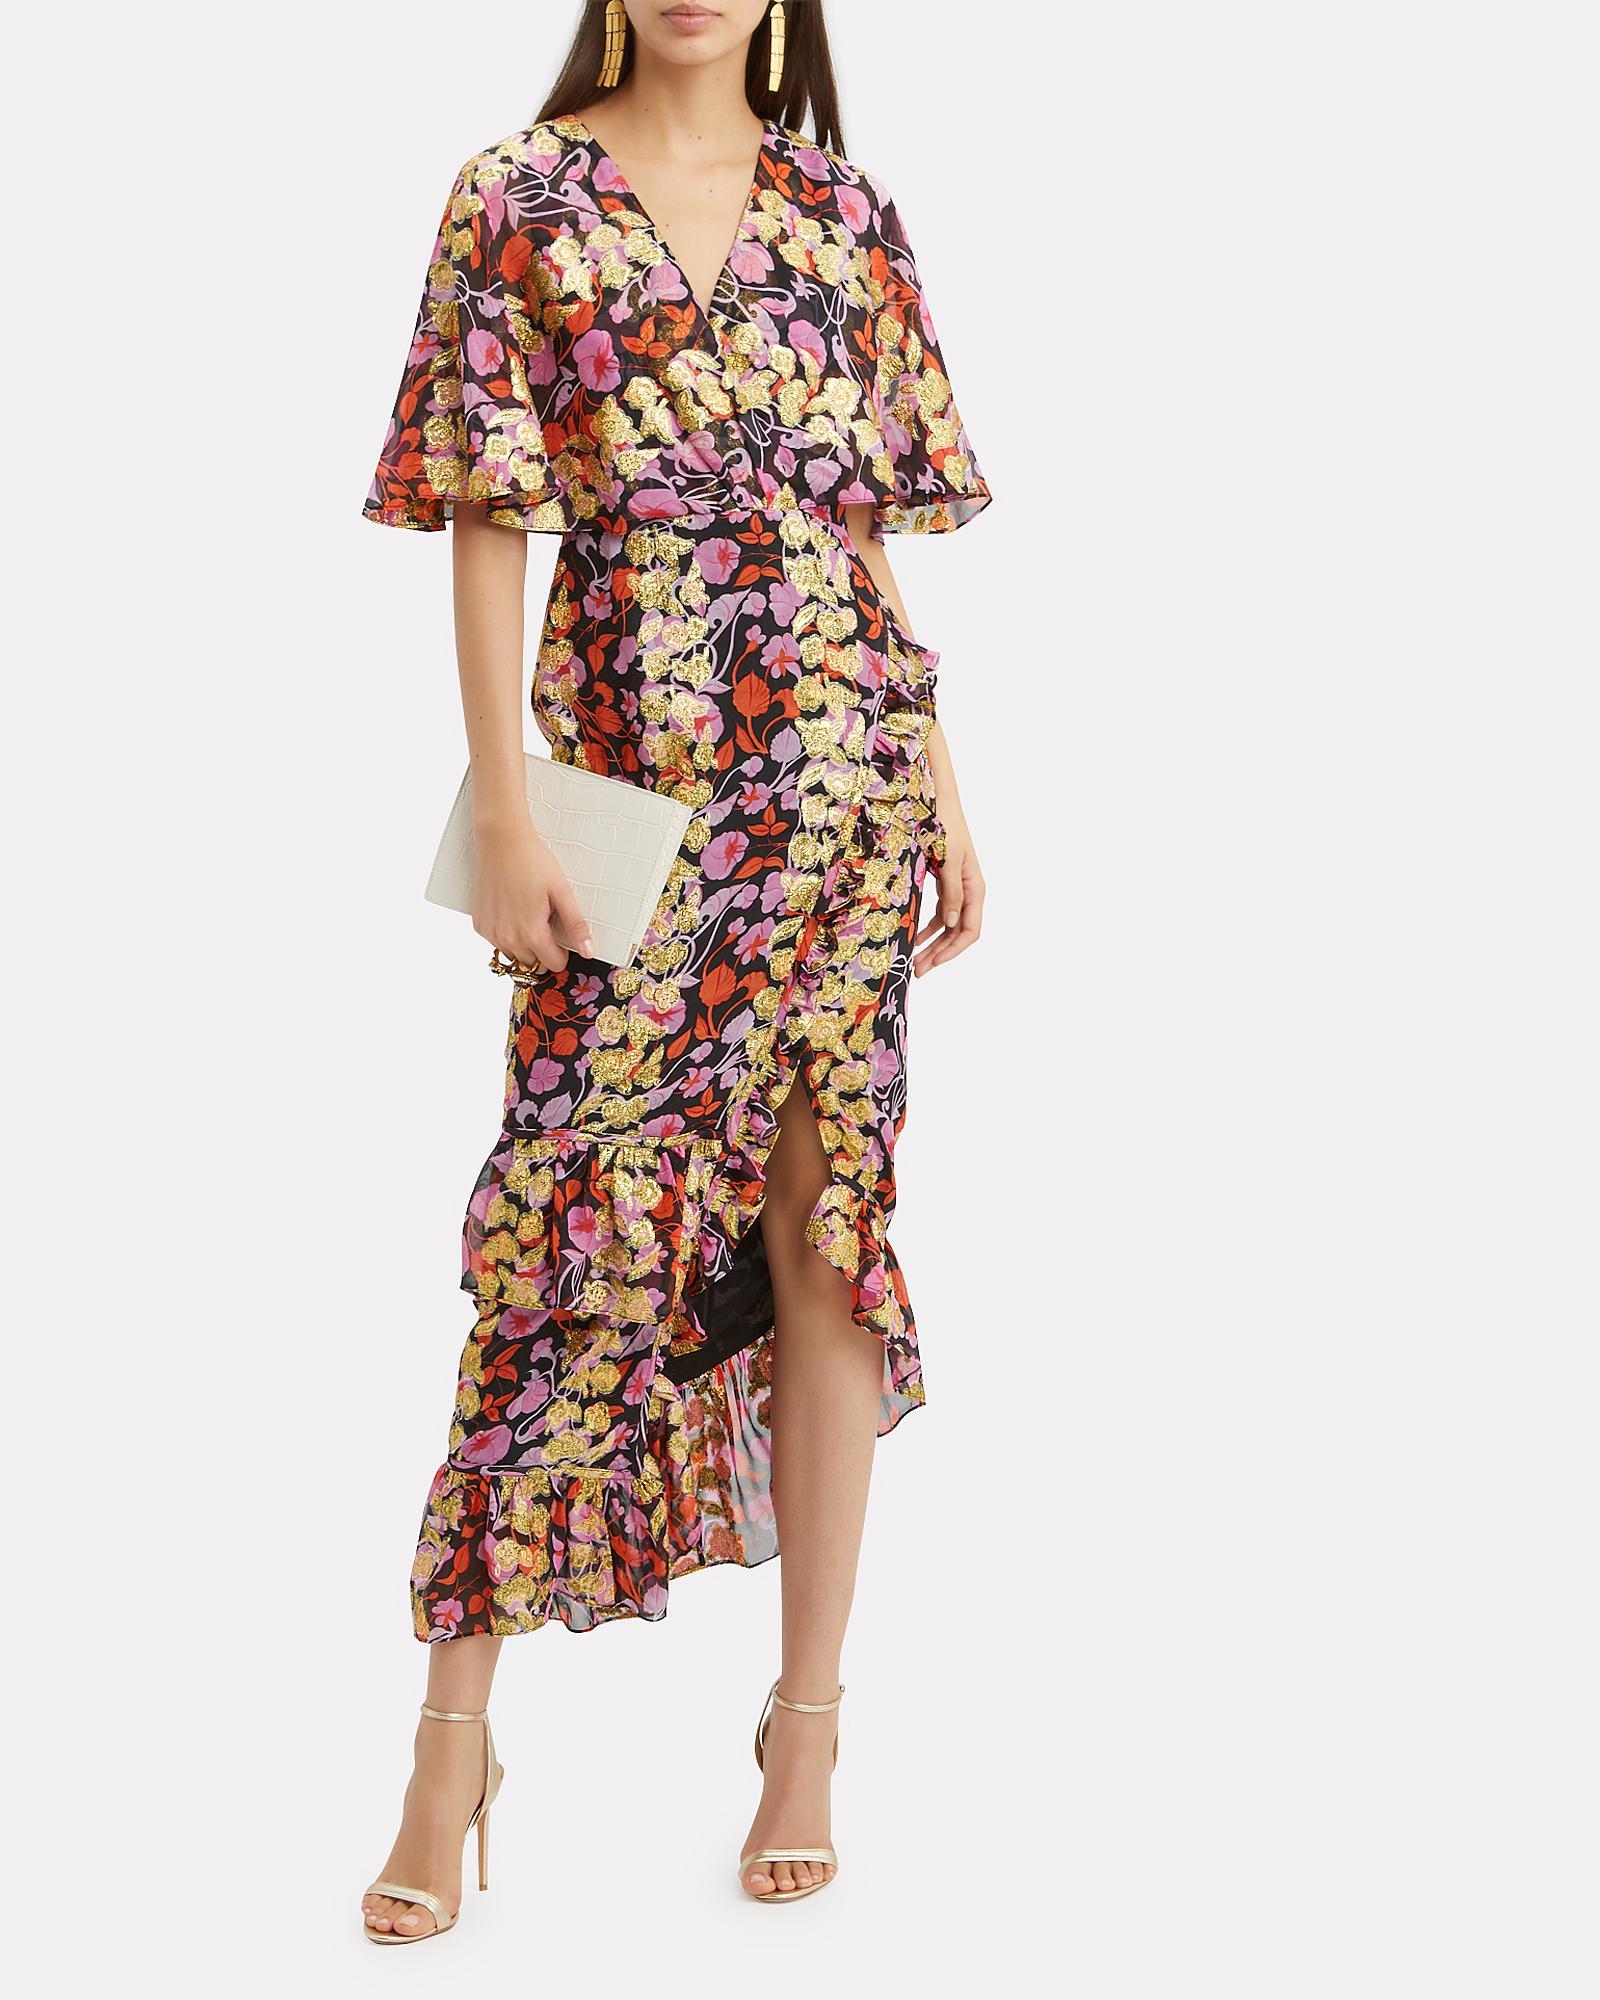 cffdf9ef7924 Lyst - Saloni Cape Overlay Metallic Floral Midi Dress